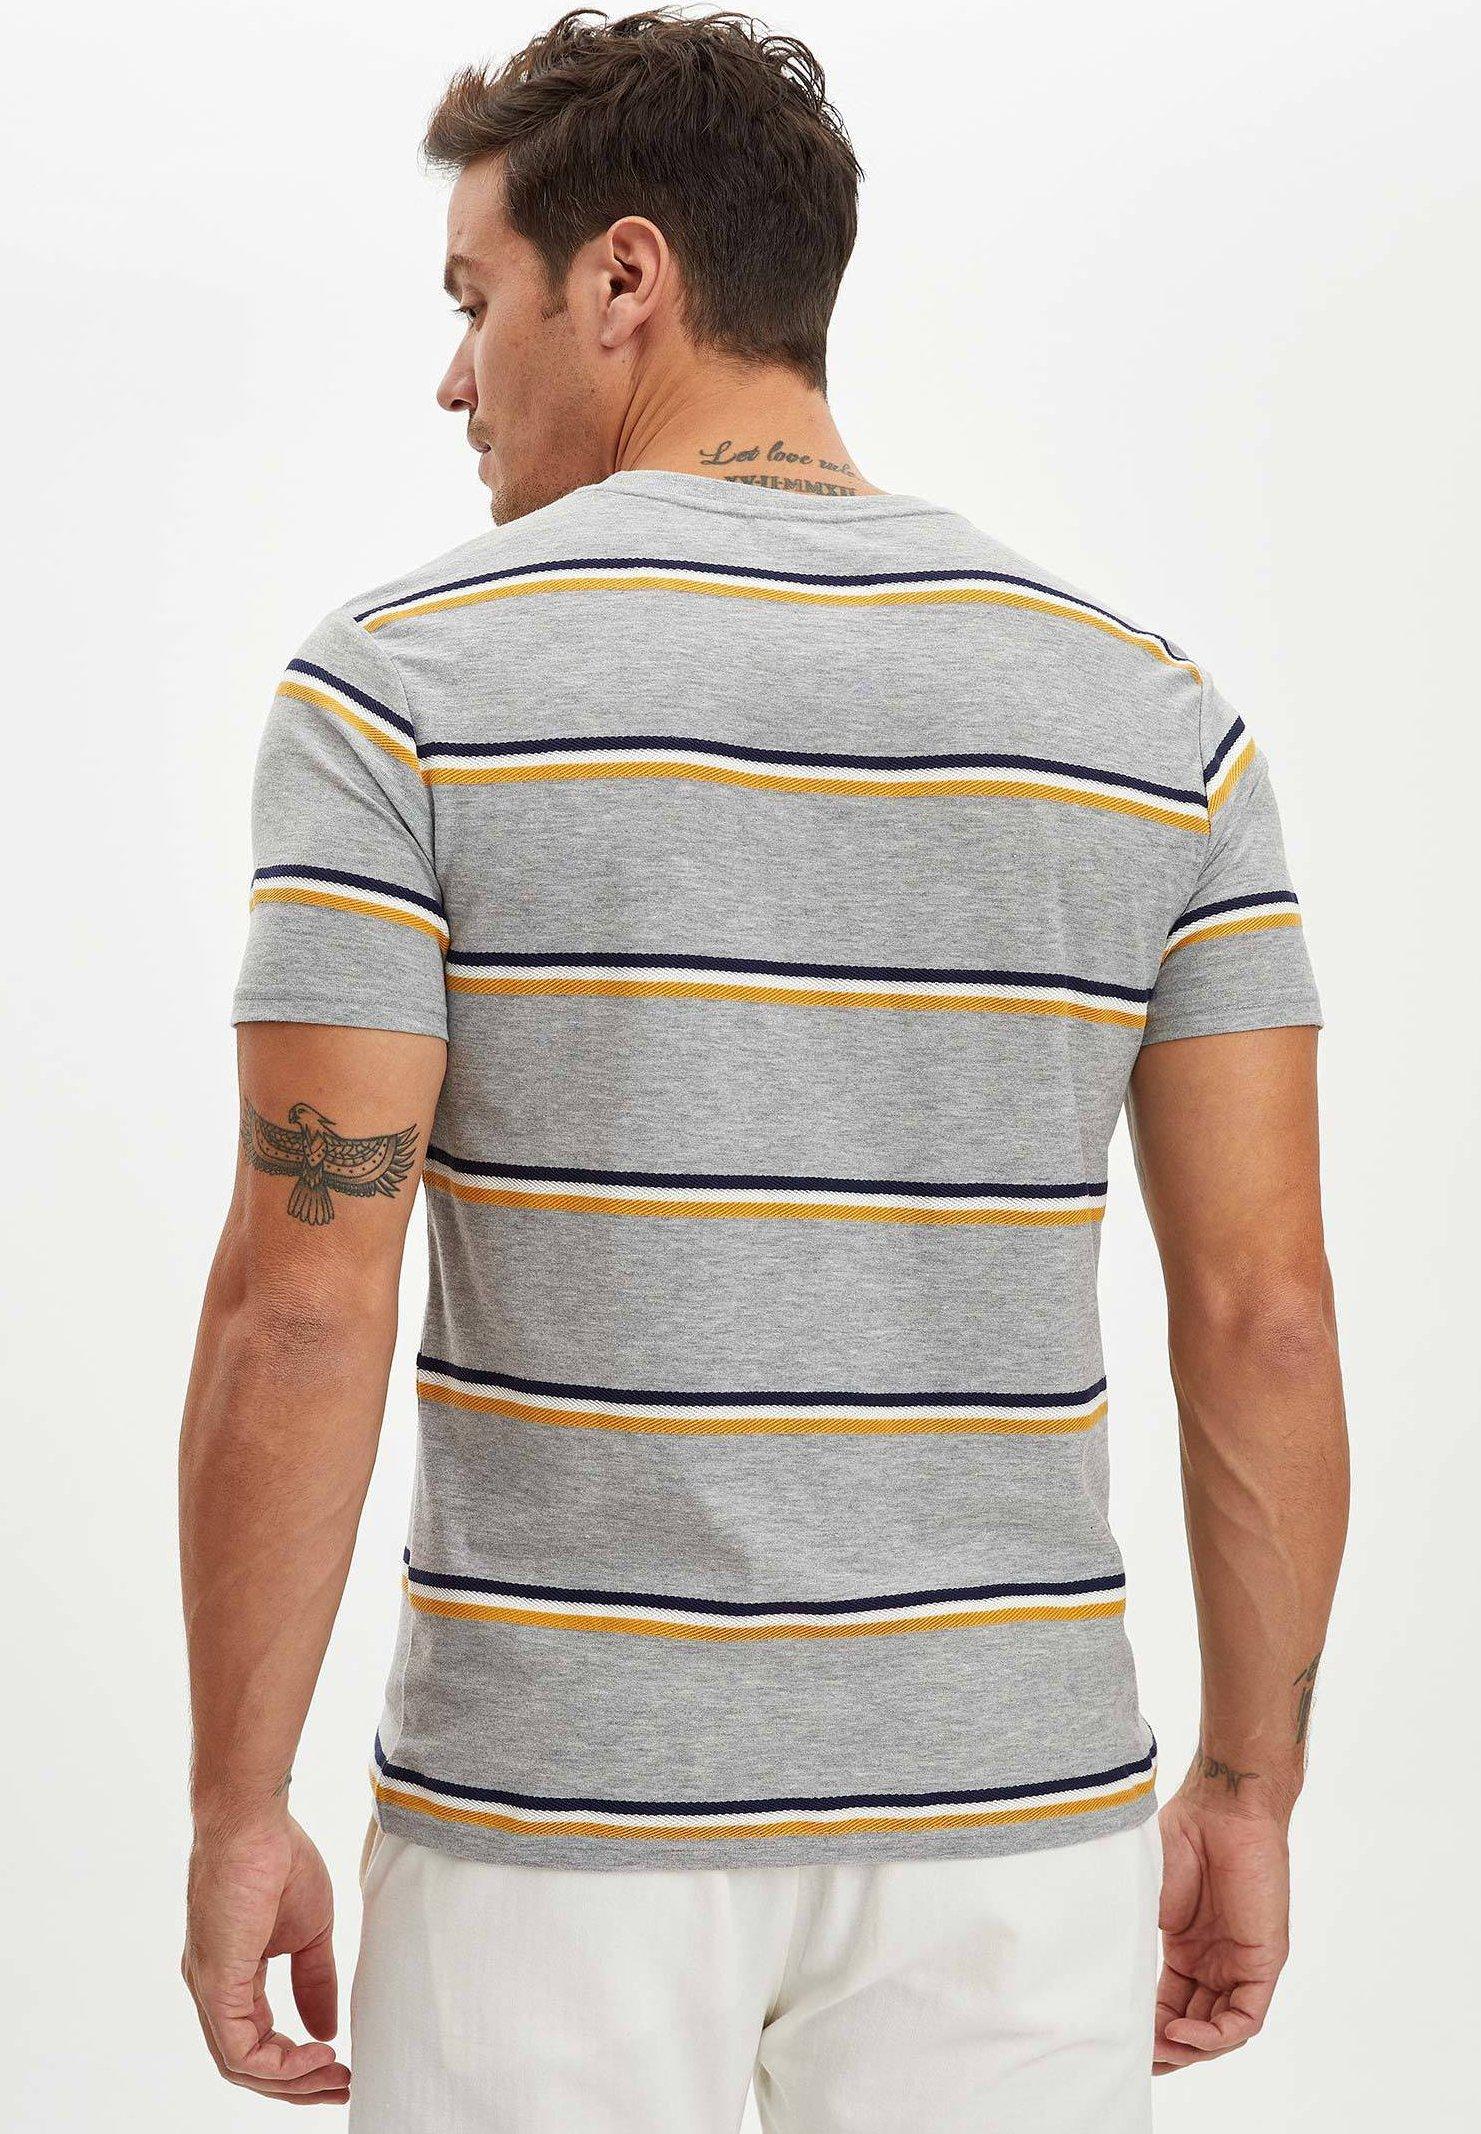 DeFacto Print T-shirt - grey 2YjZ0